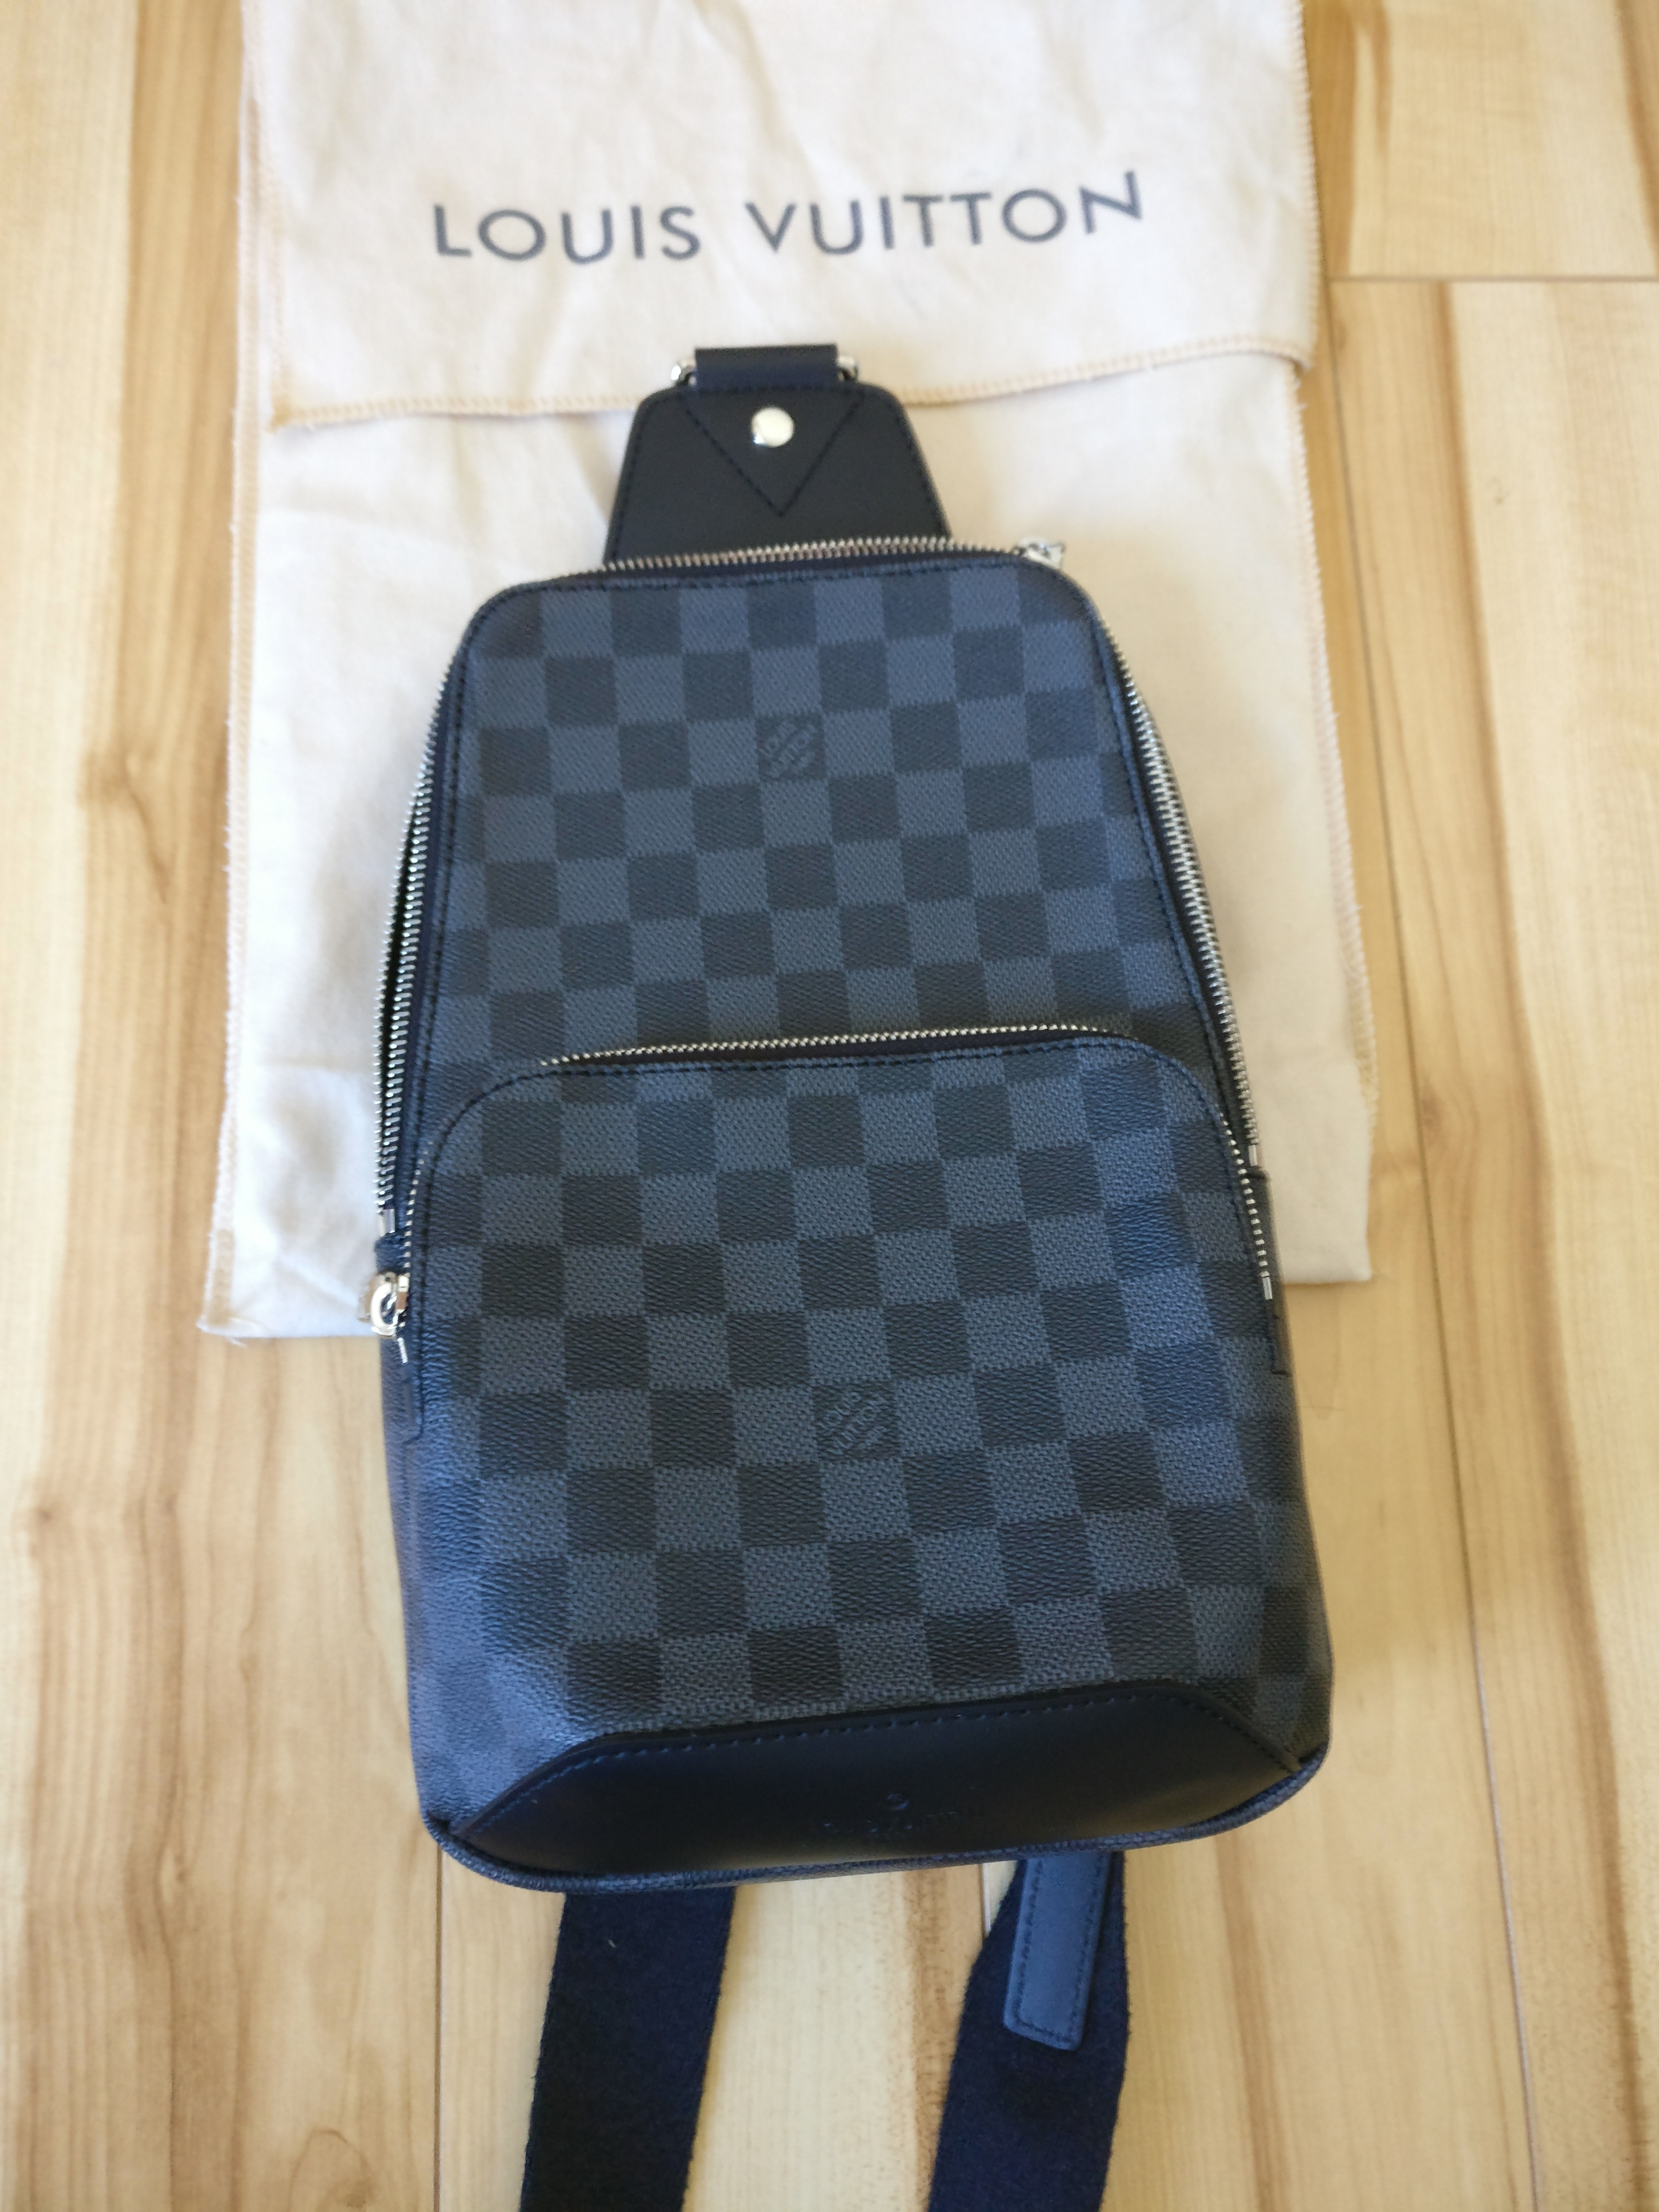 Louis Vuitton Louis Vuitton Avenue Sling Bag Size one size - Bags   Luggage  for Sale - Grailed 15006168d9e8f